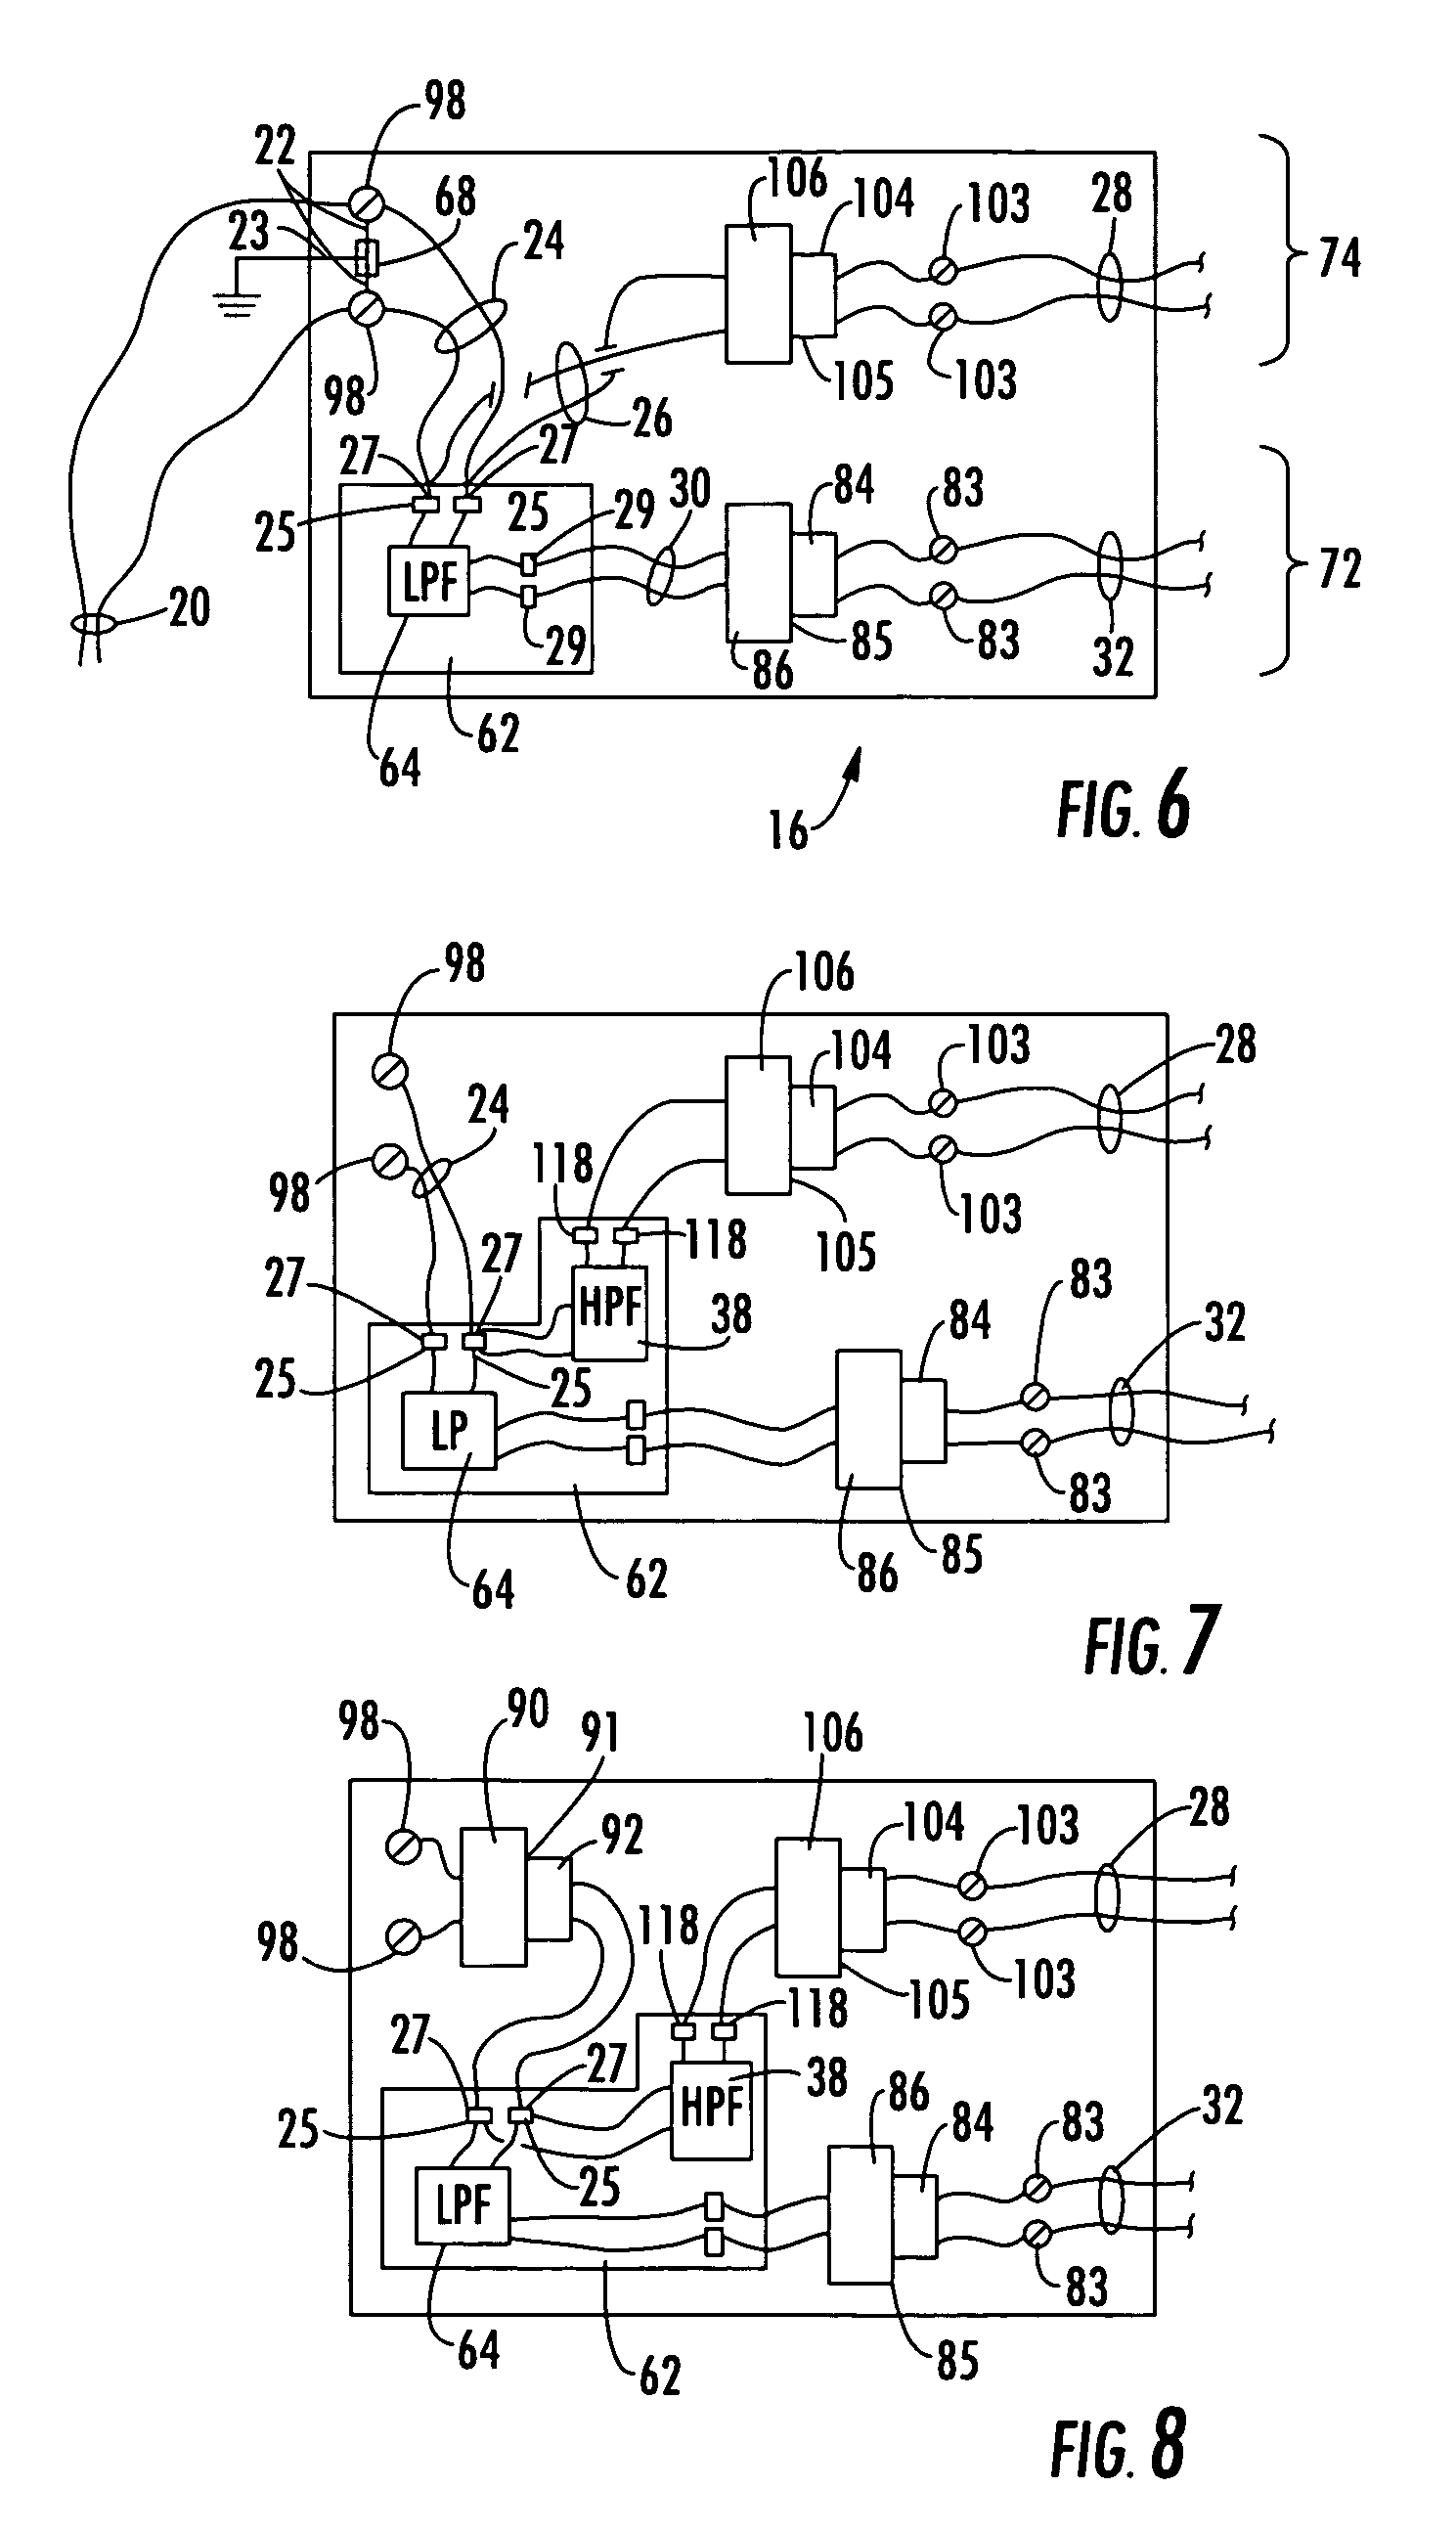 Adsl Central Filter Wiring Diagram : 34 Wiring Diagram